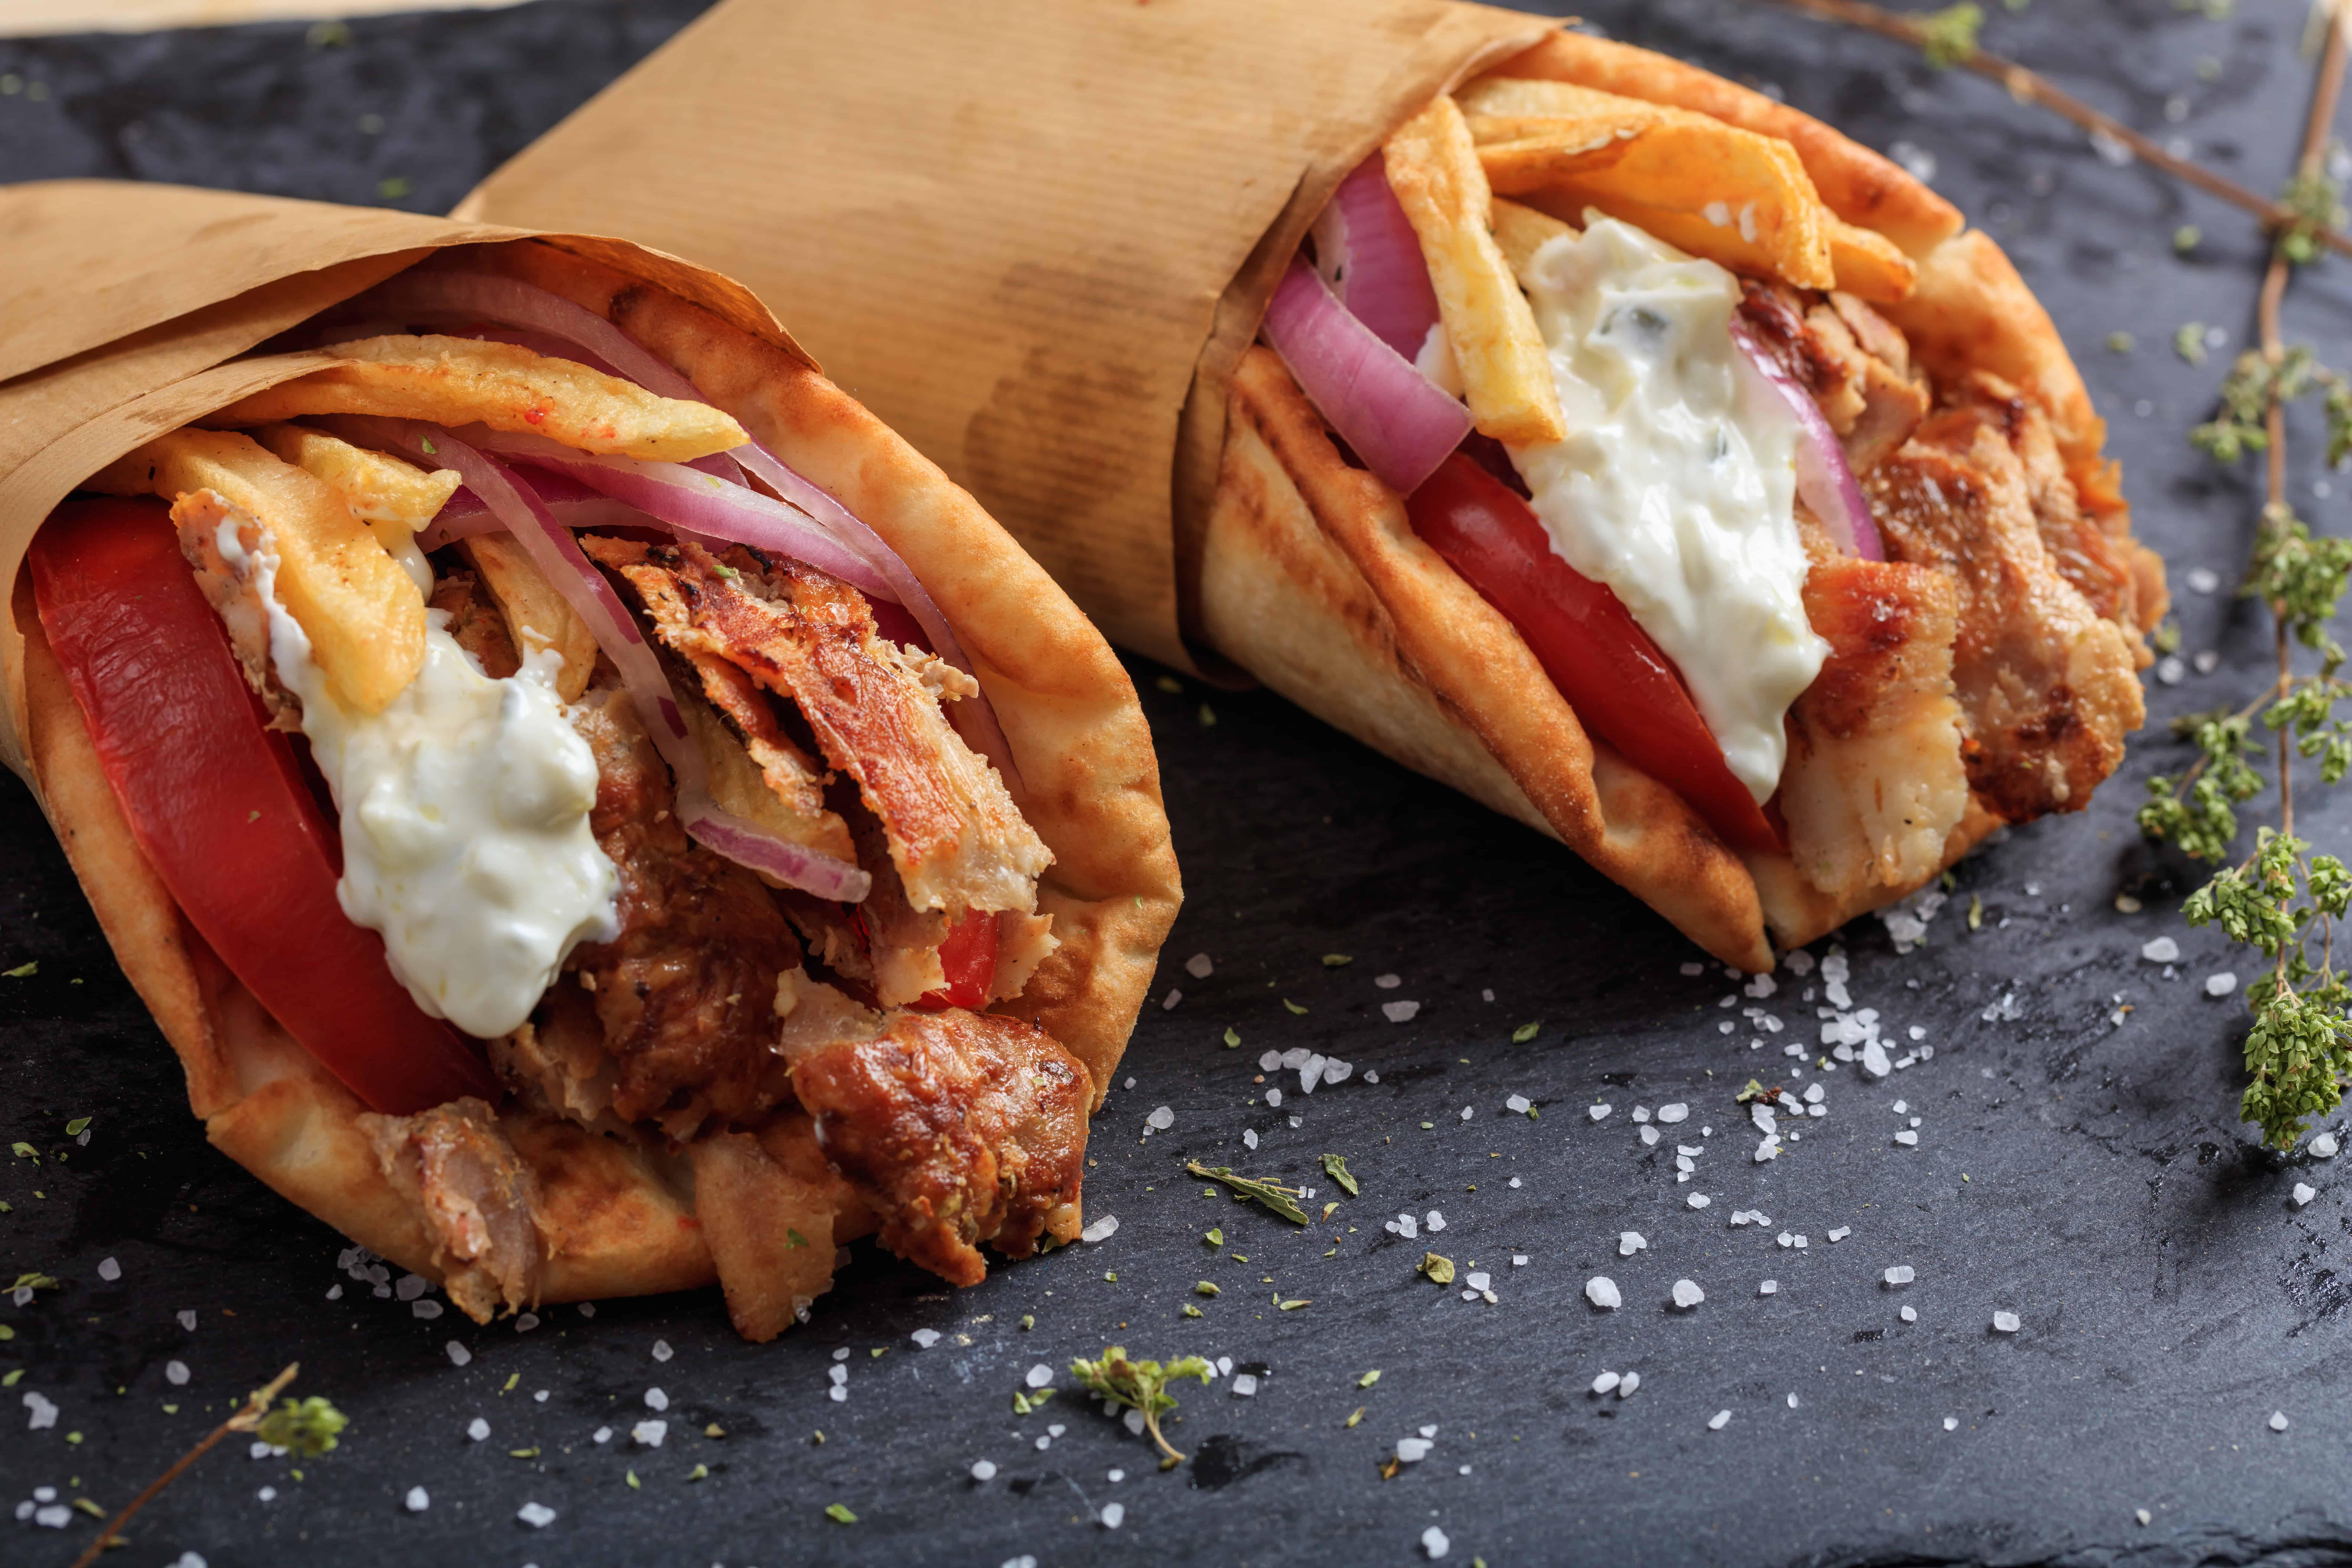 Homemade Greek Pork Gyros Souvlaki recipe